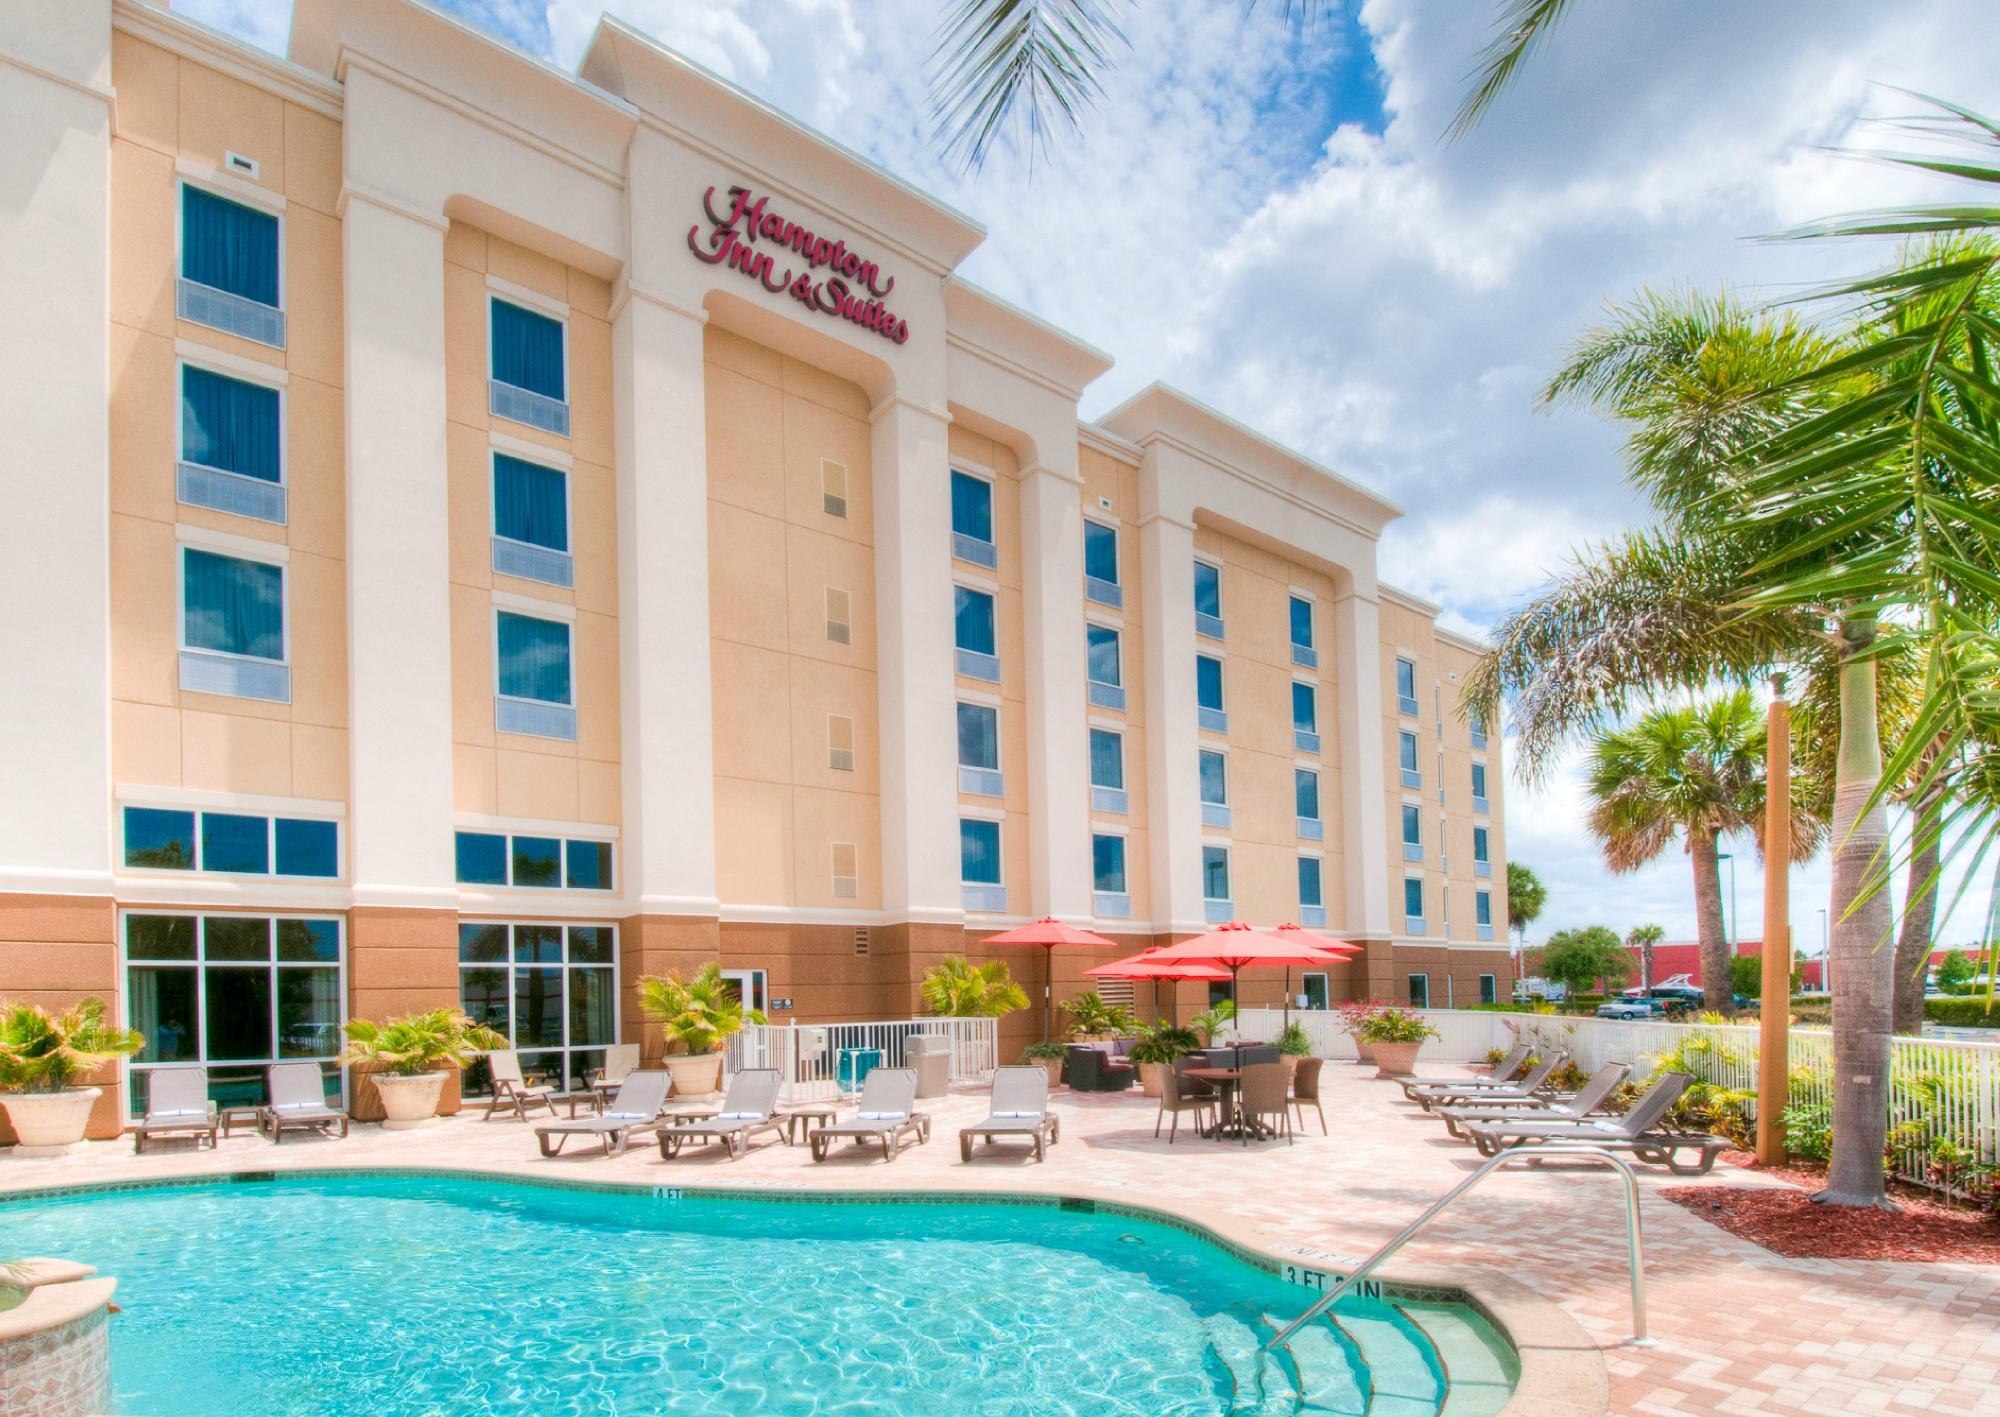 Hampton Inn Suites Fort Myers Colonial Blvd Photo